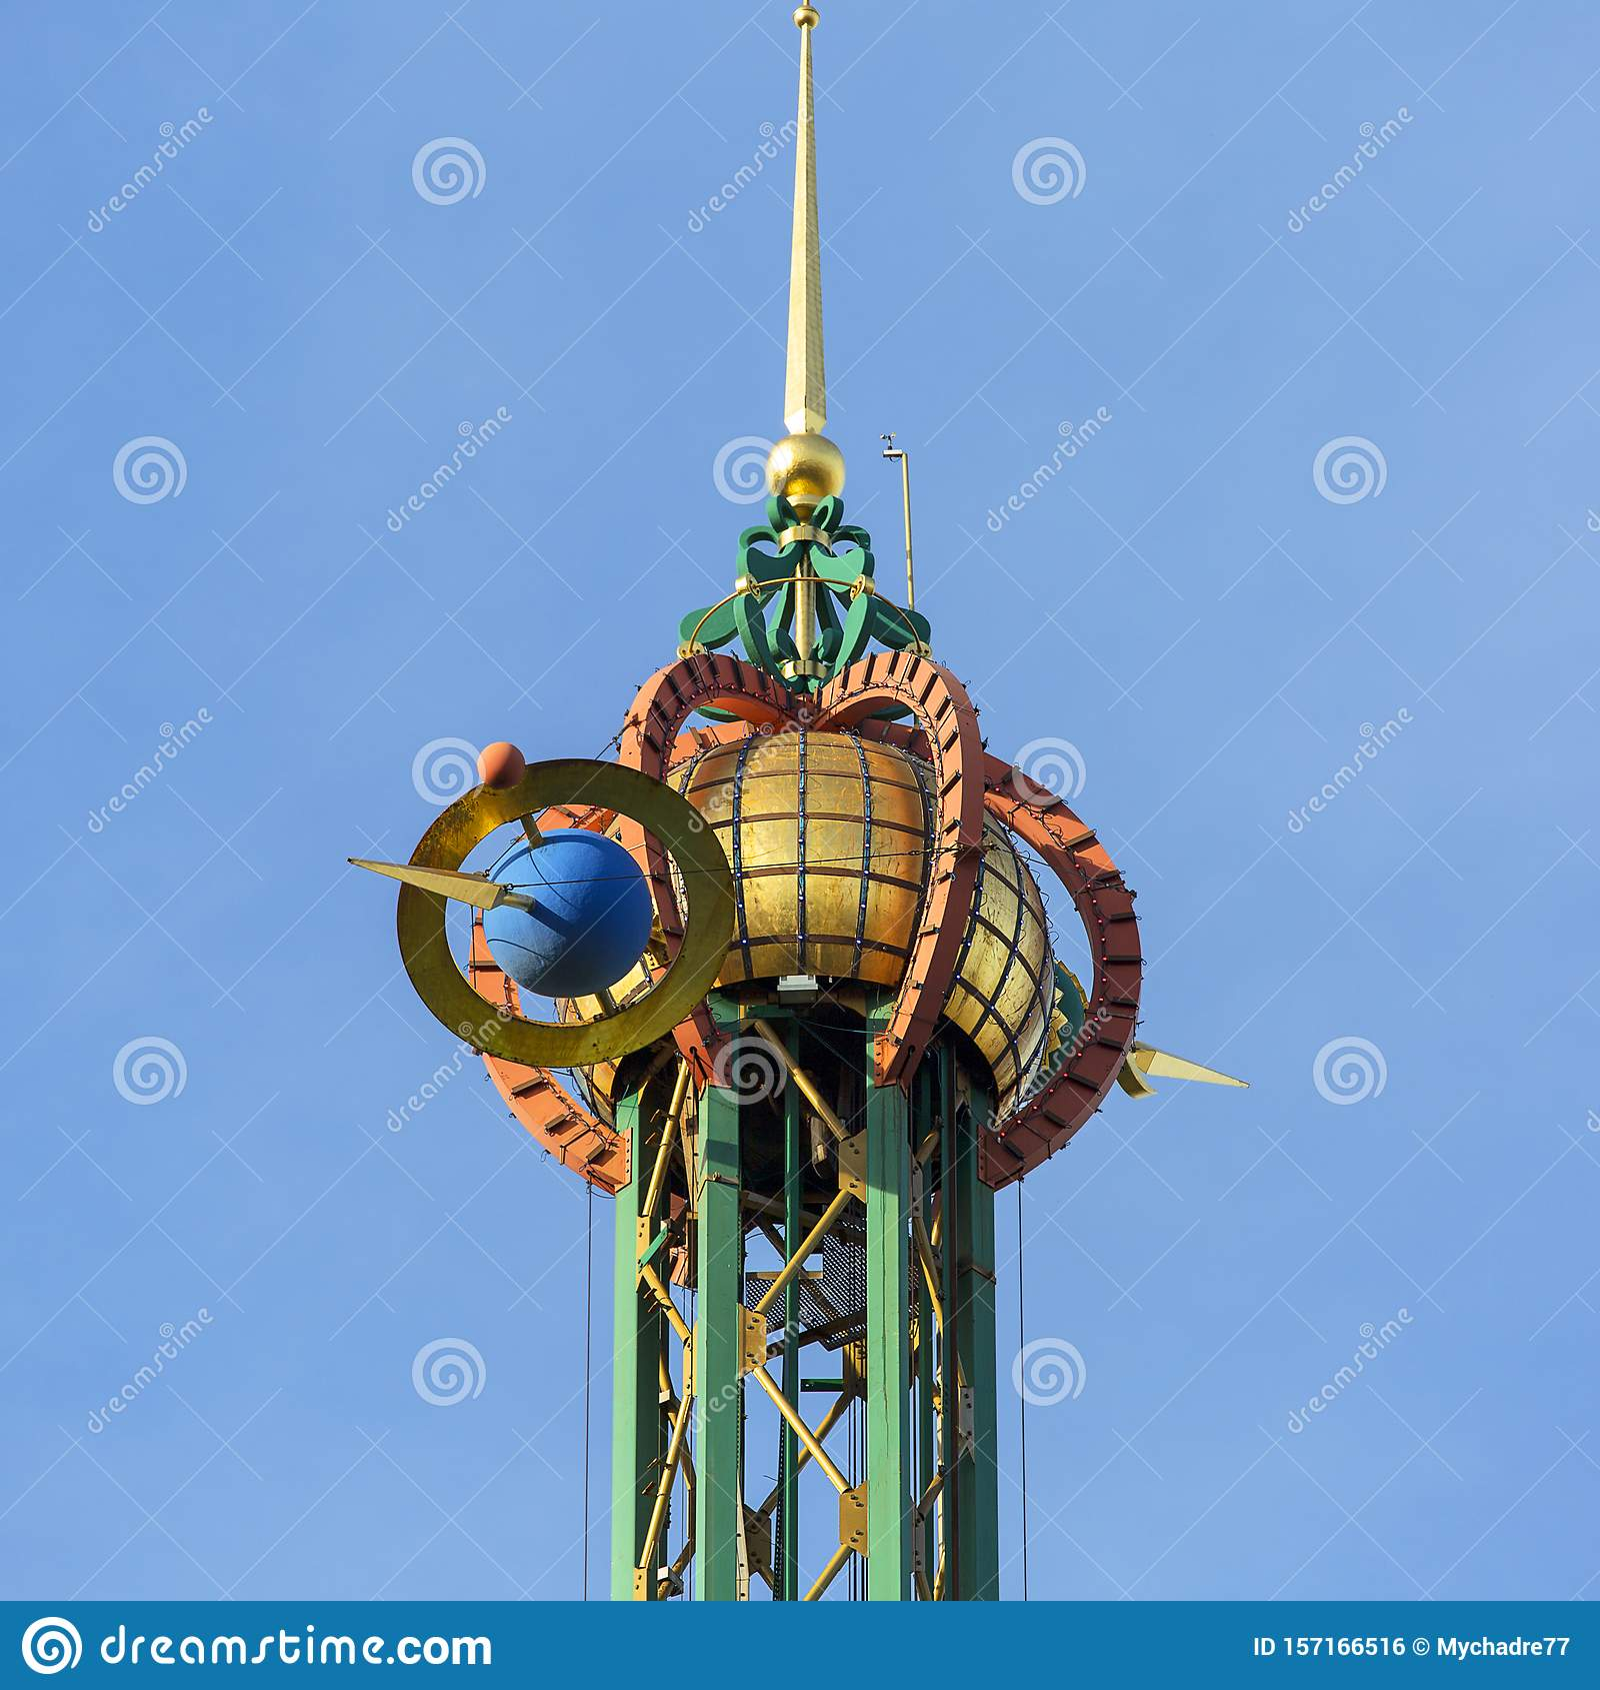 Star Flyer carousel in Amusement Park, Tivoli Gardens, view on the decorative top, Copenhagen, Denmark